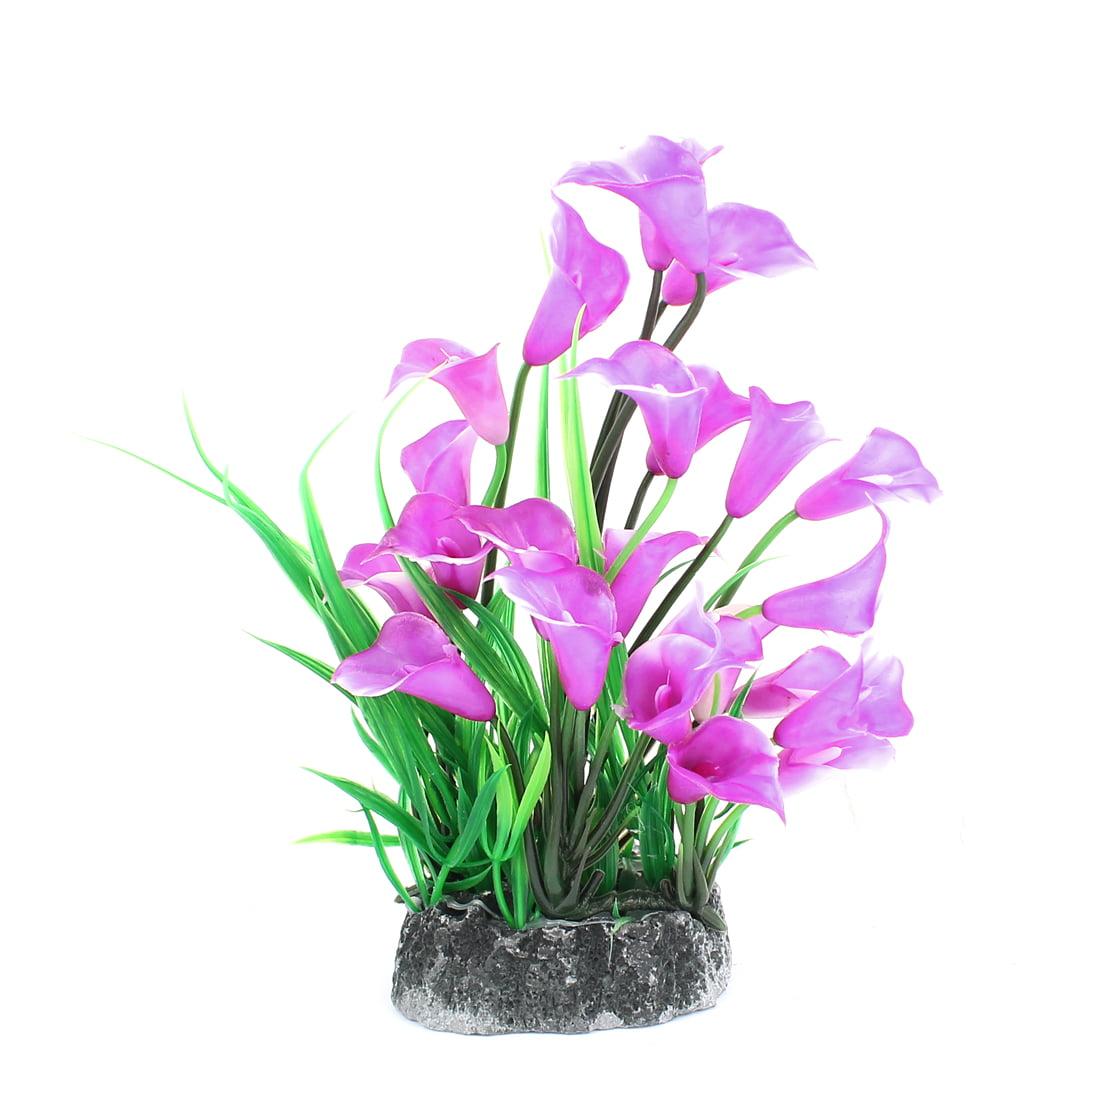 Aquarium Fish Tank Fishbowl Artificial Grass Plant Decor Green Purple 23cm